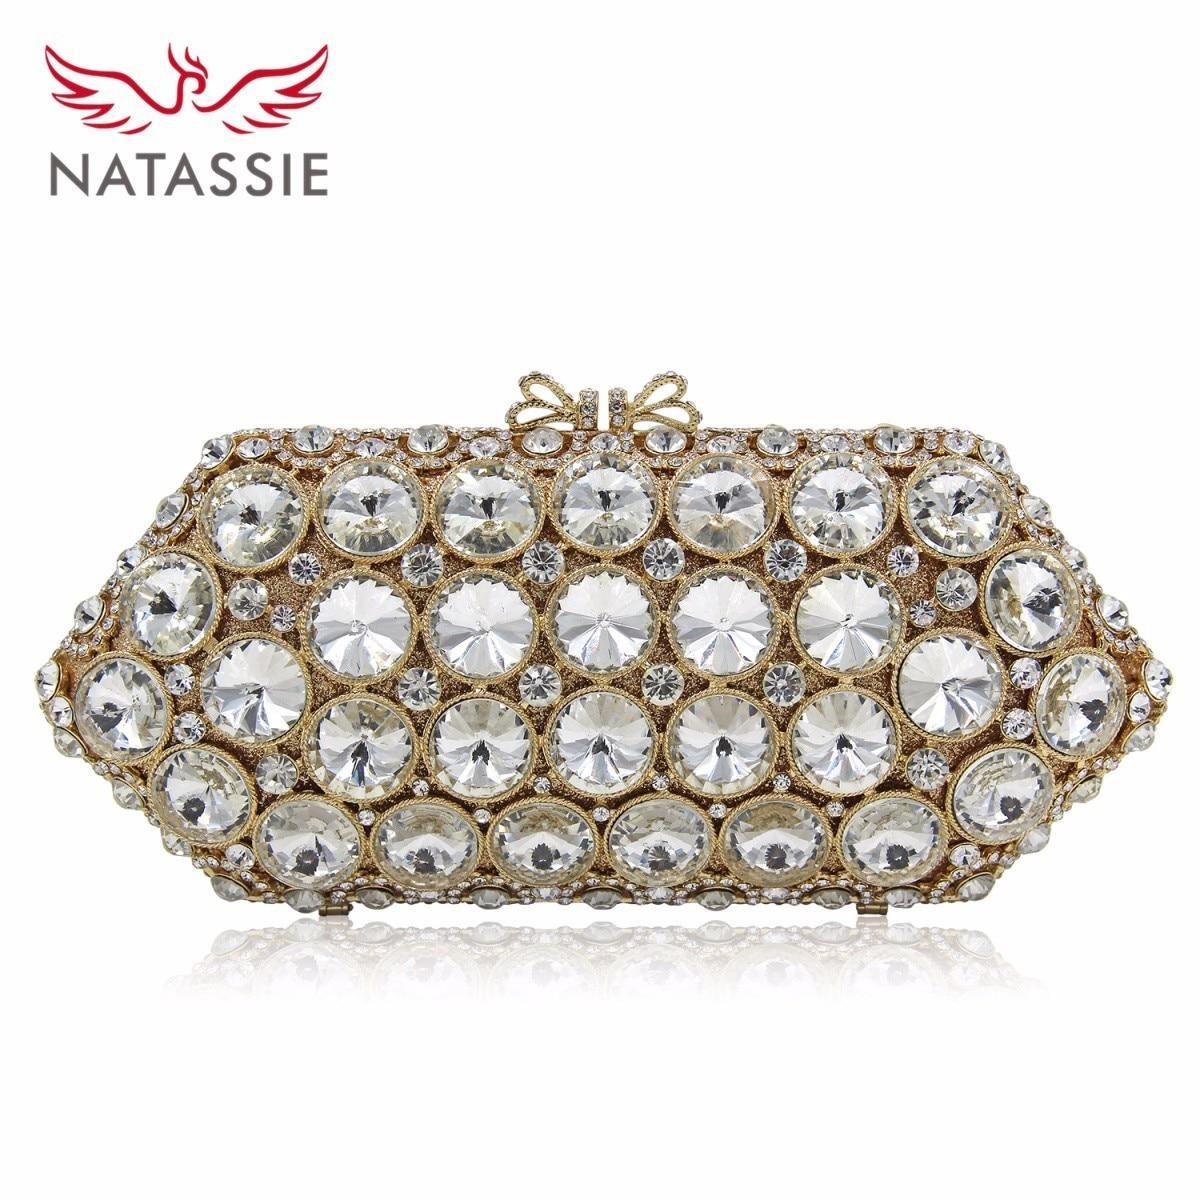 NATASSIE Women Clutches Crystal Bag White Stone Wedding Party Clutch Bags Shoulder Long Chain Gold luxury crystal clutch handbag women evening bag wedding party purses banquet